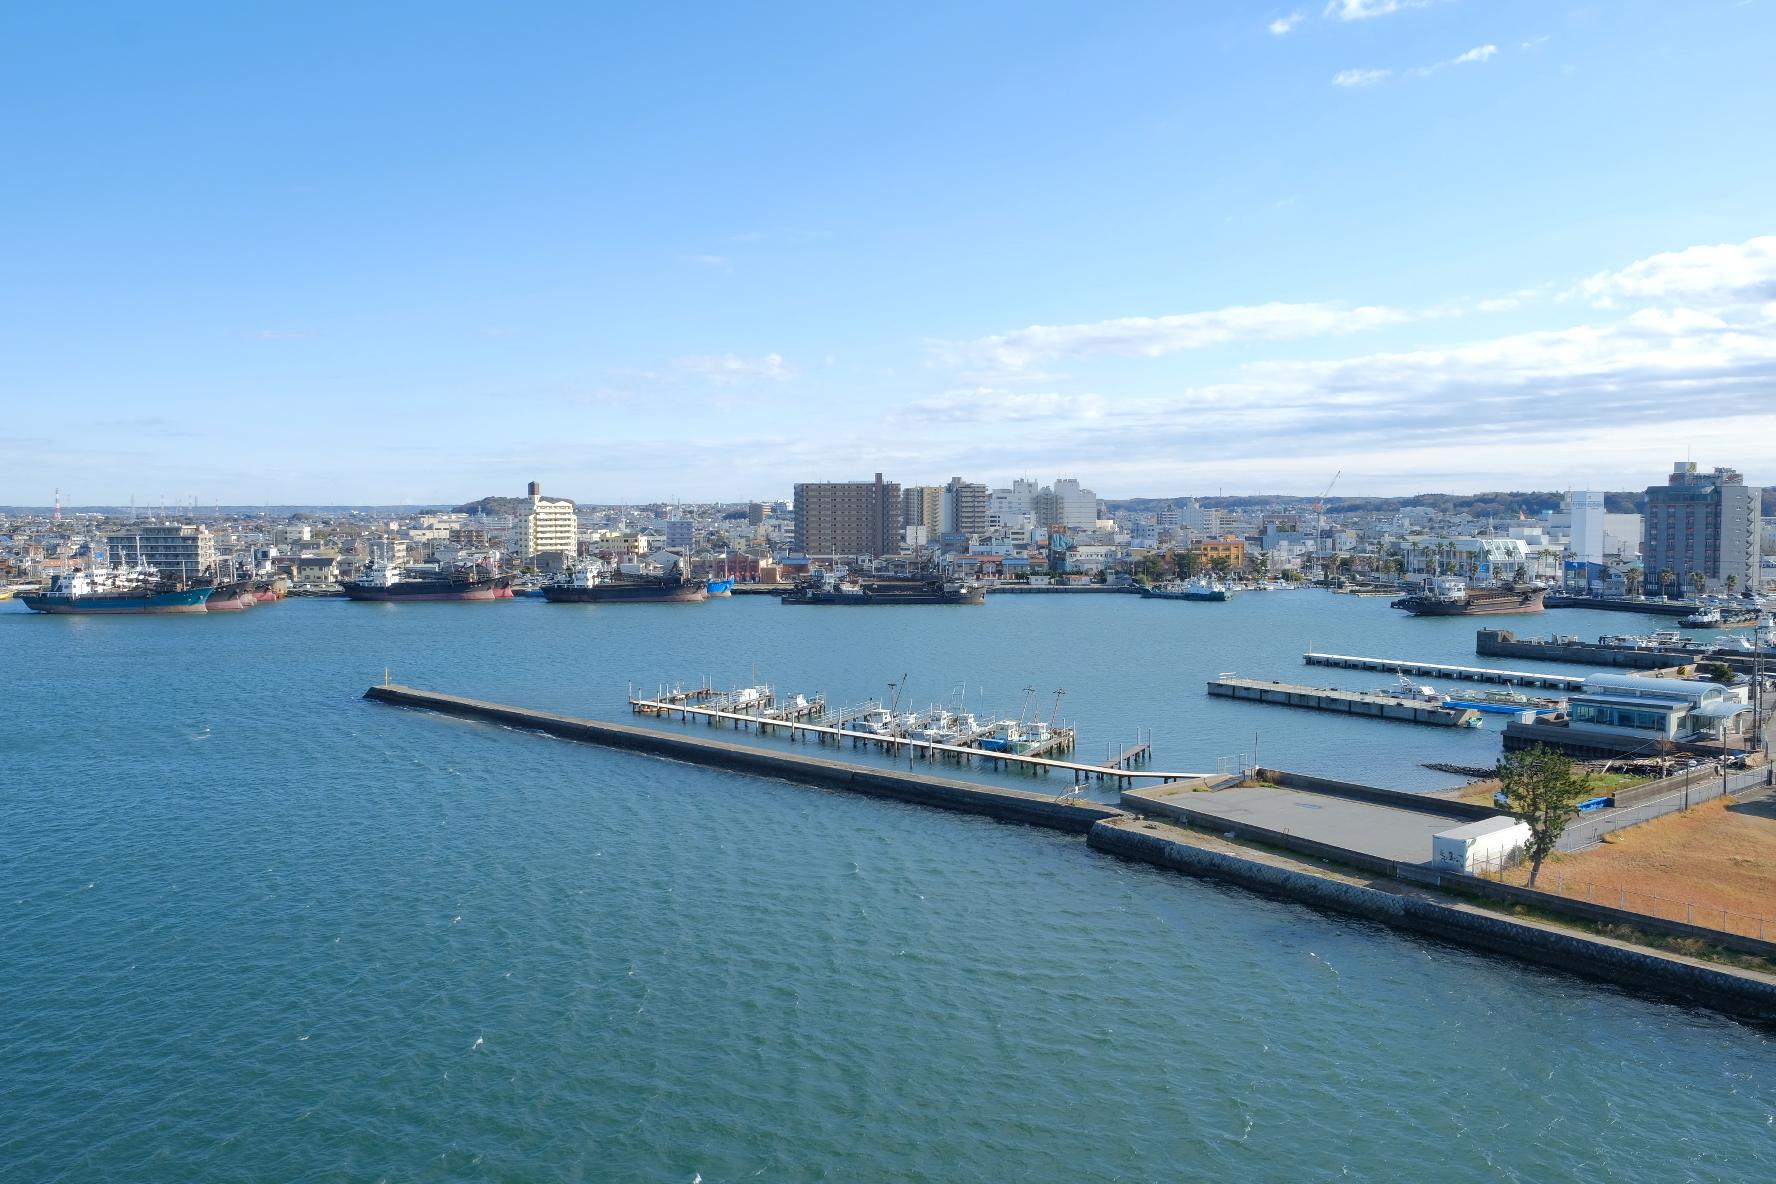 木更津港 中の島